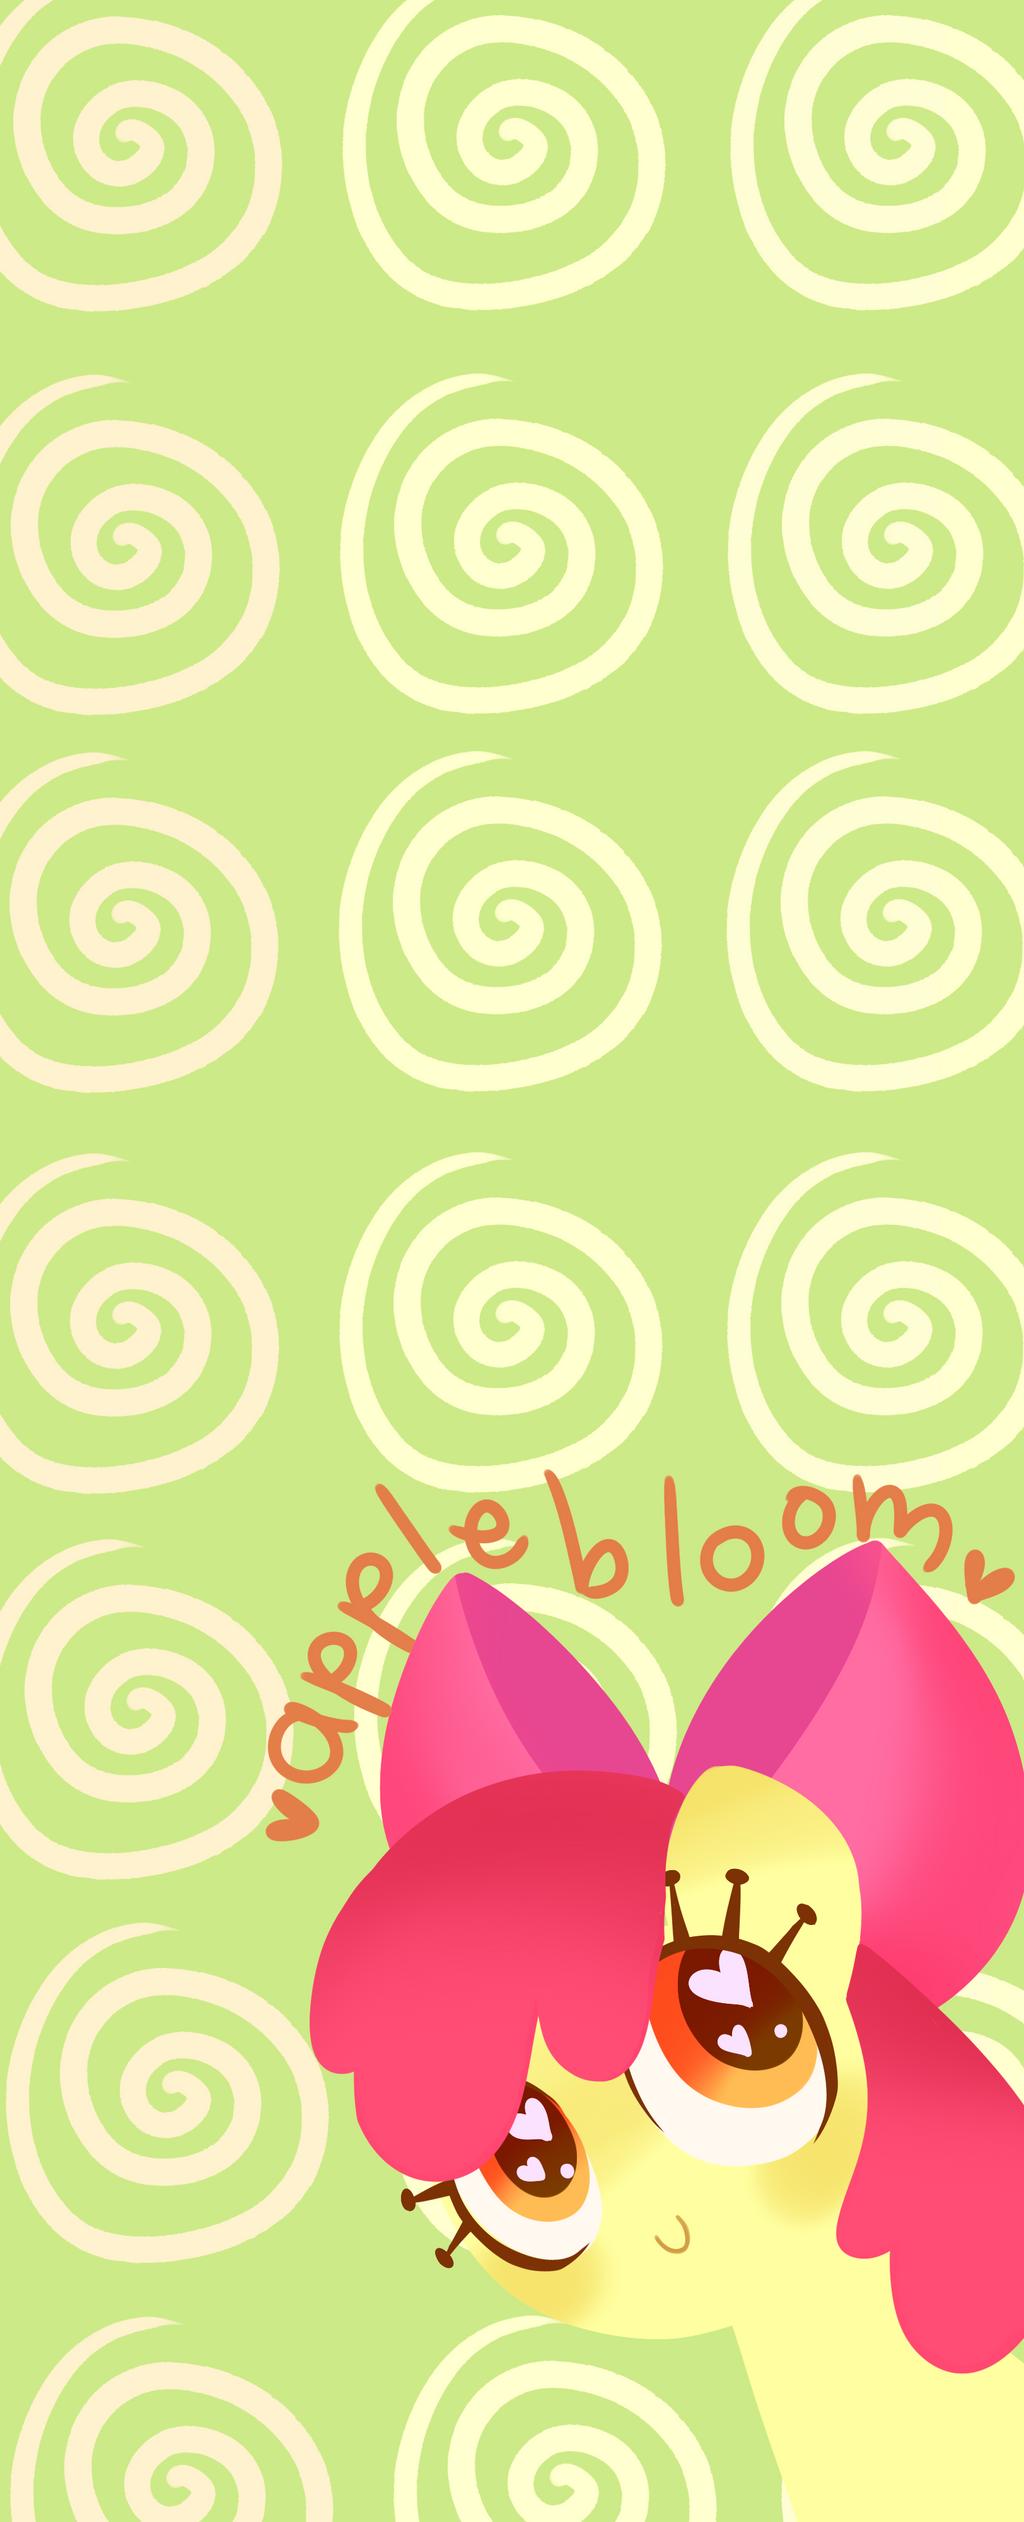 Appleblook by CosmicPonye